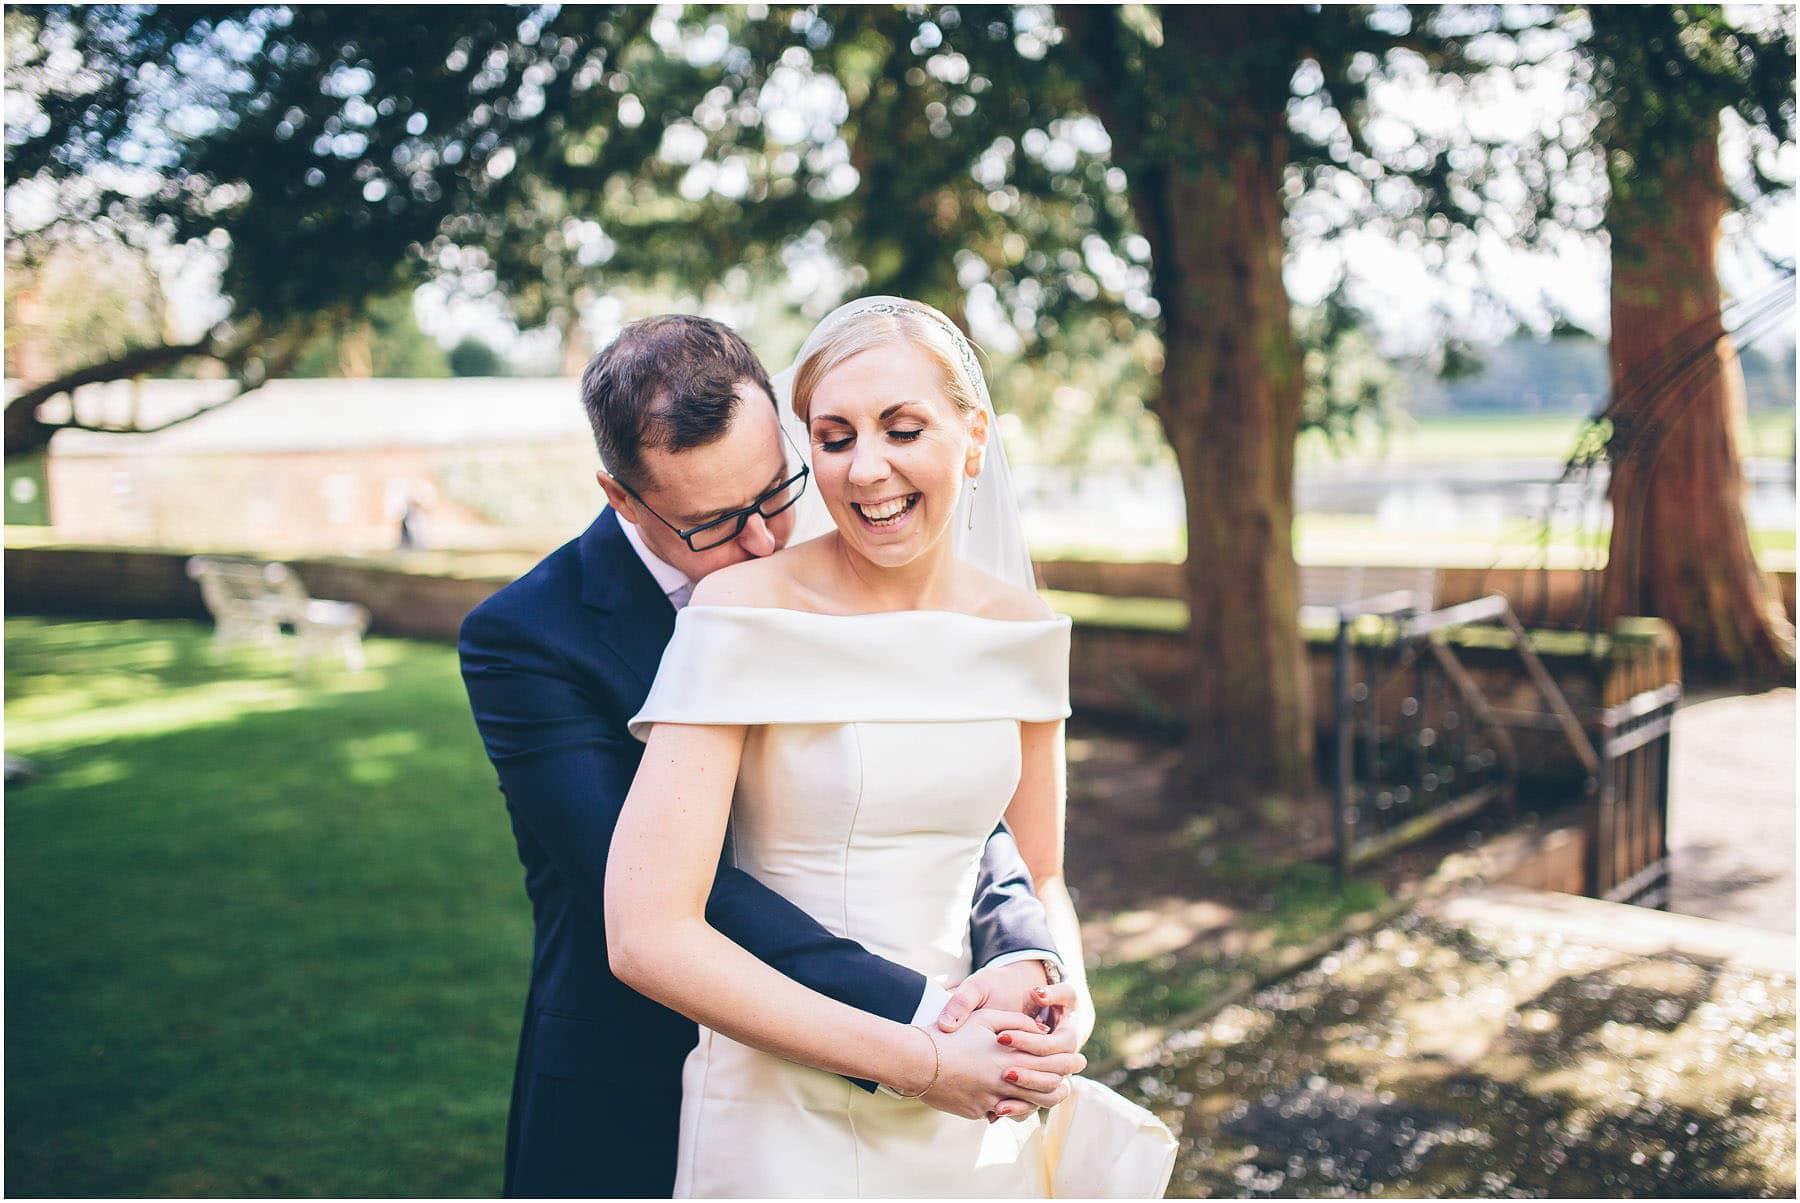 Capesthorne_Hall_Wedding_Photography_0100